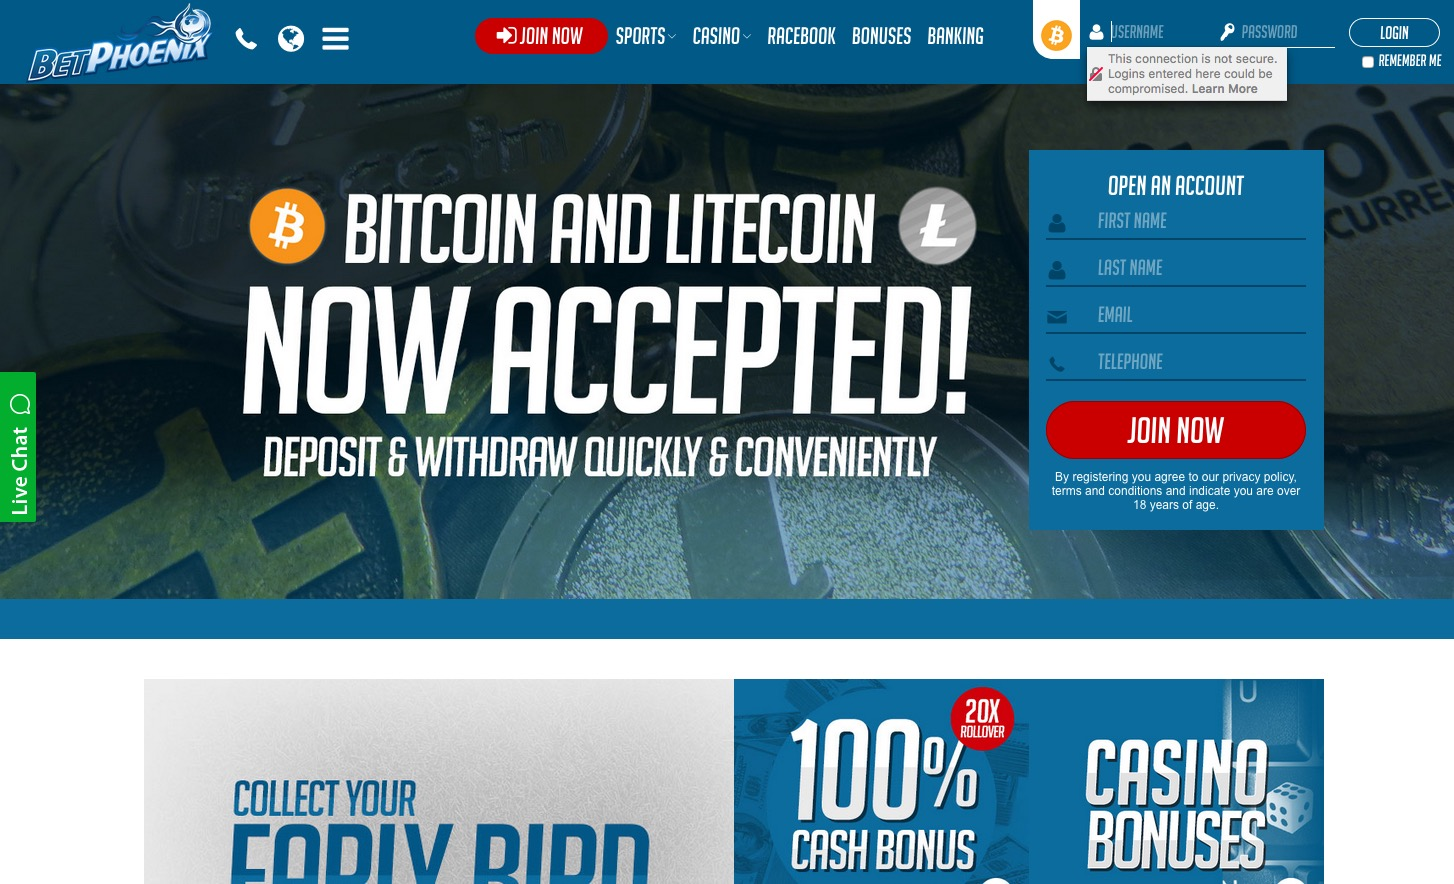 online casino server software